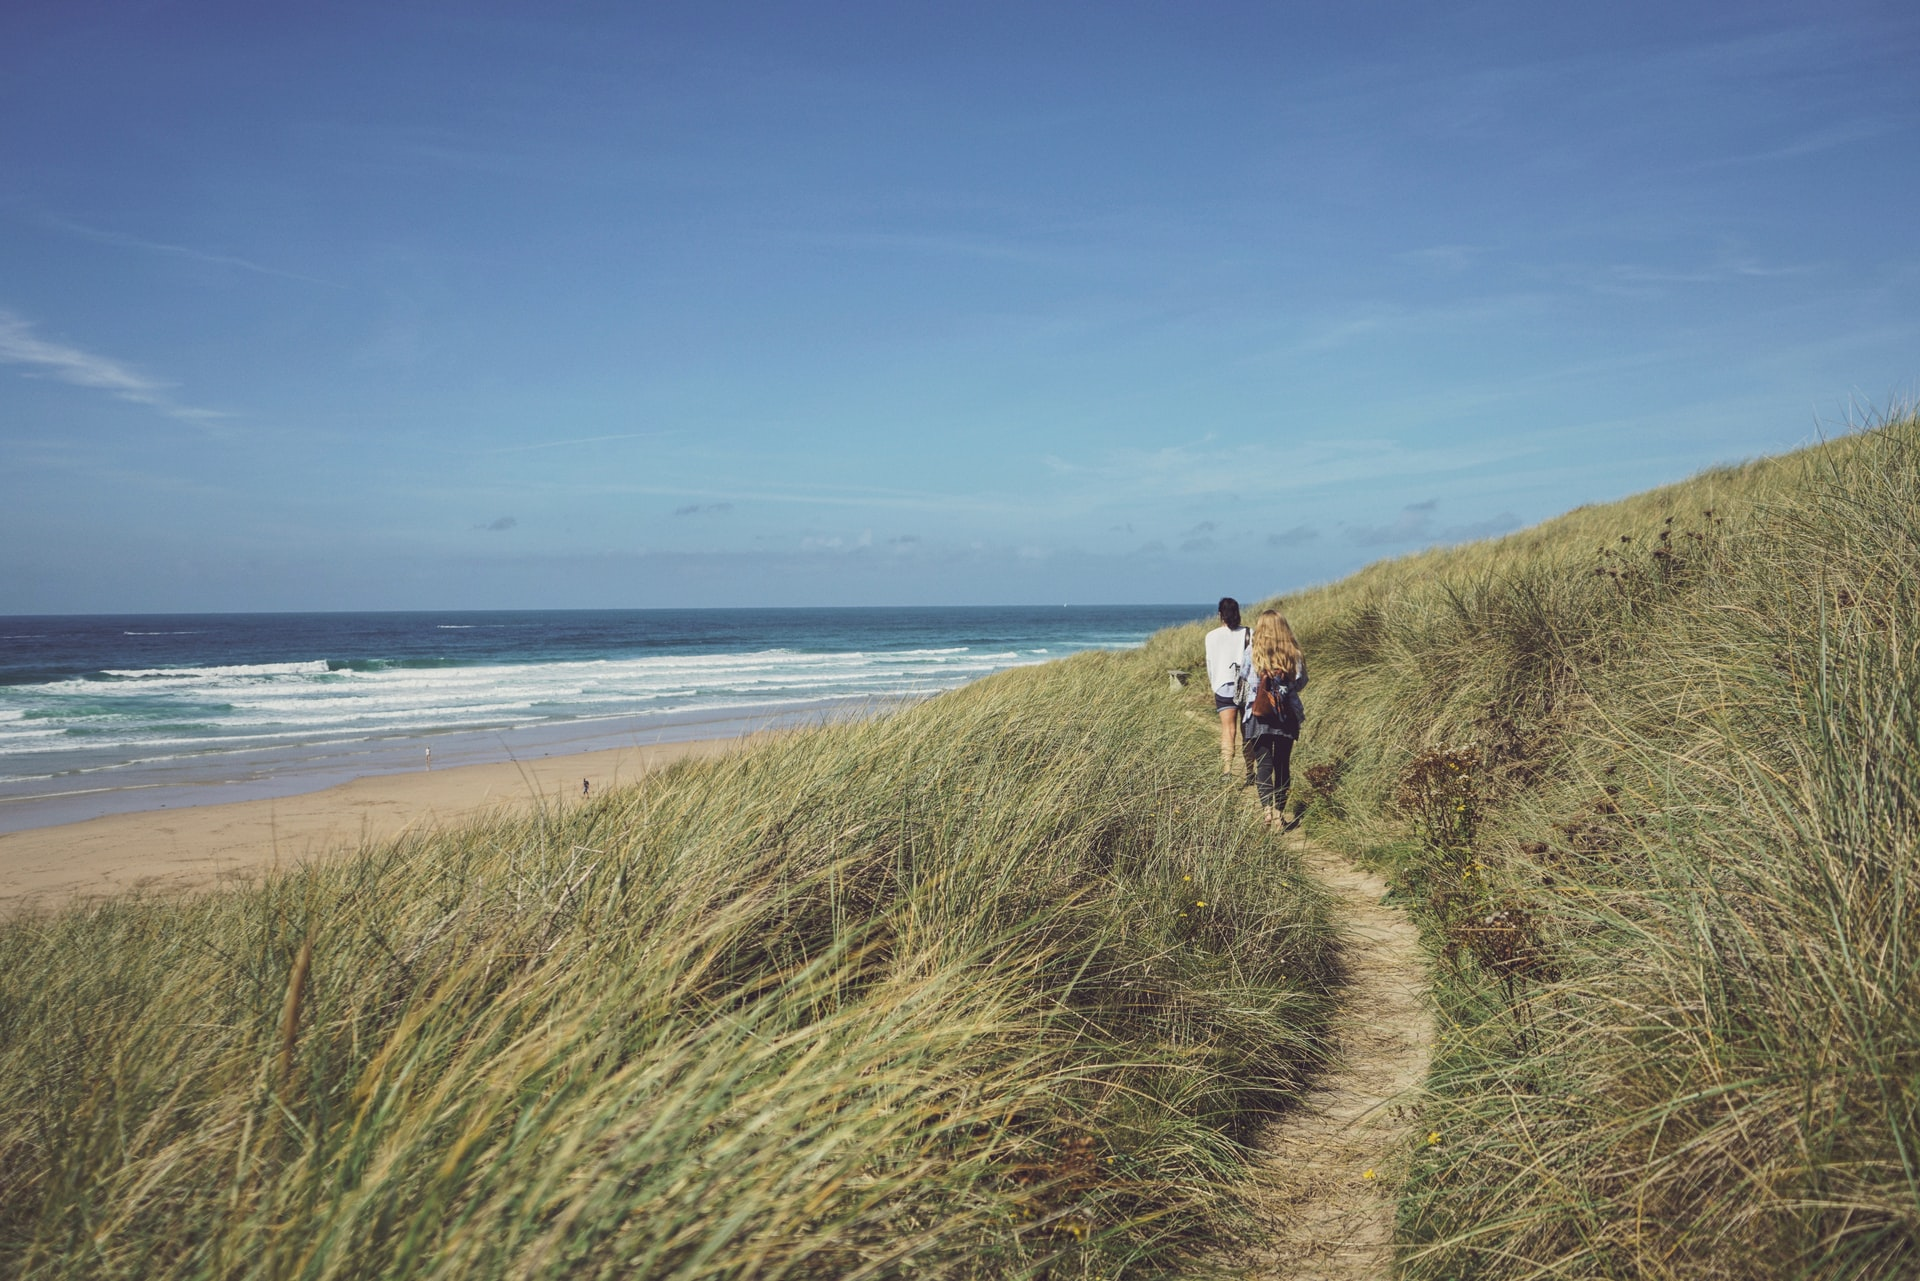 perranporth beach plage angleterre royaume uni